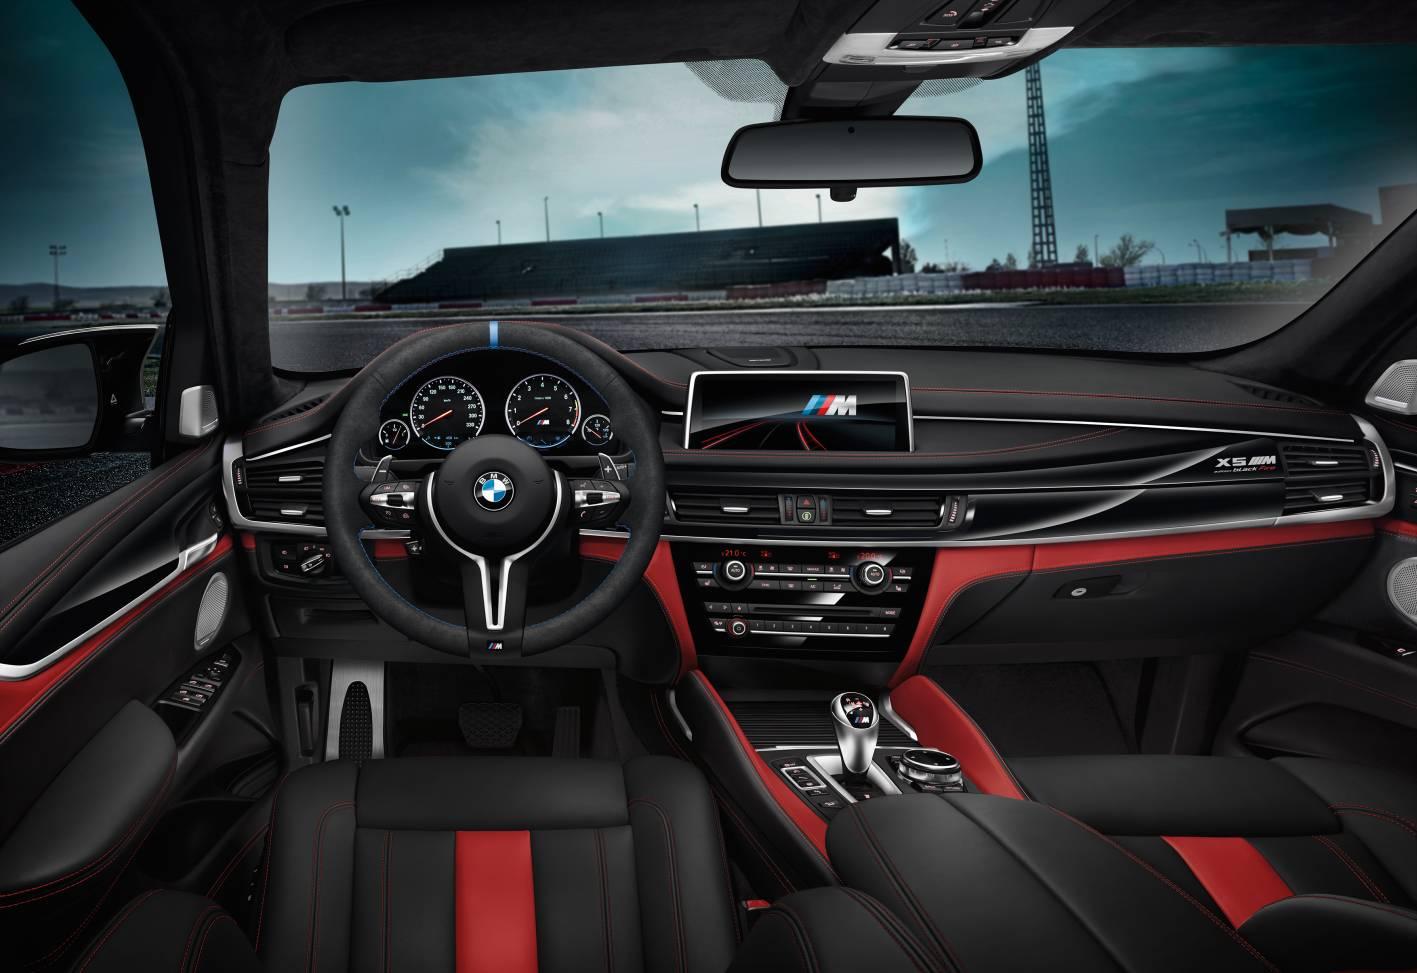 2017 BMW X5 M Black Fire Edition Interior